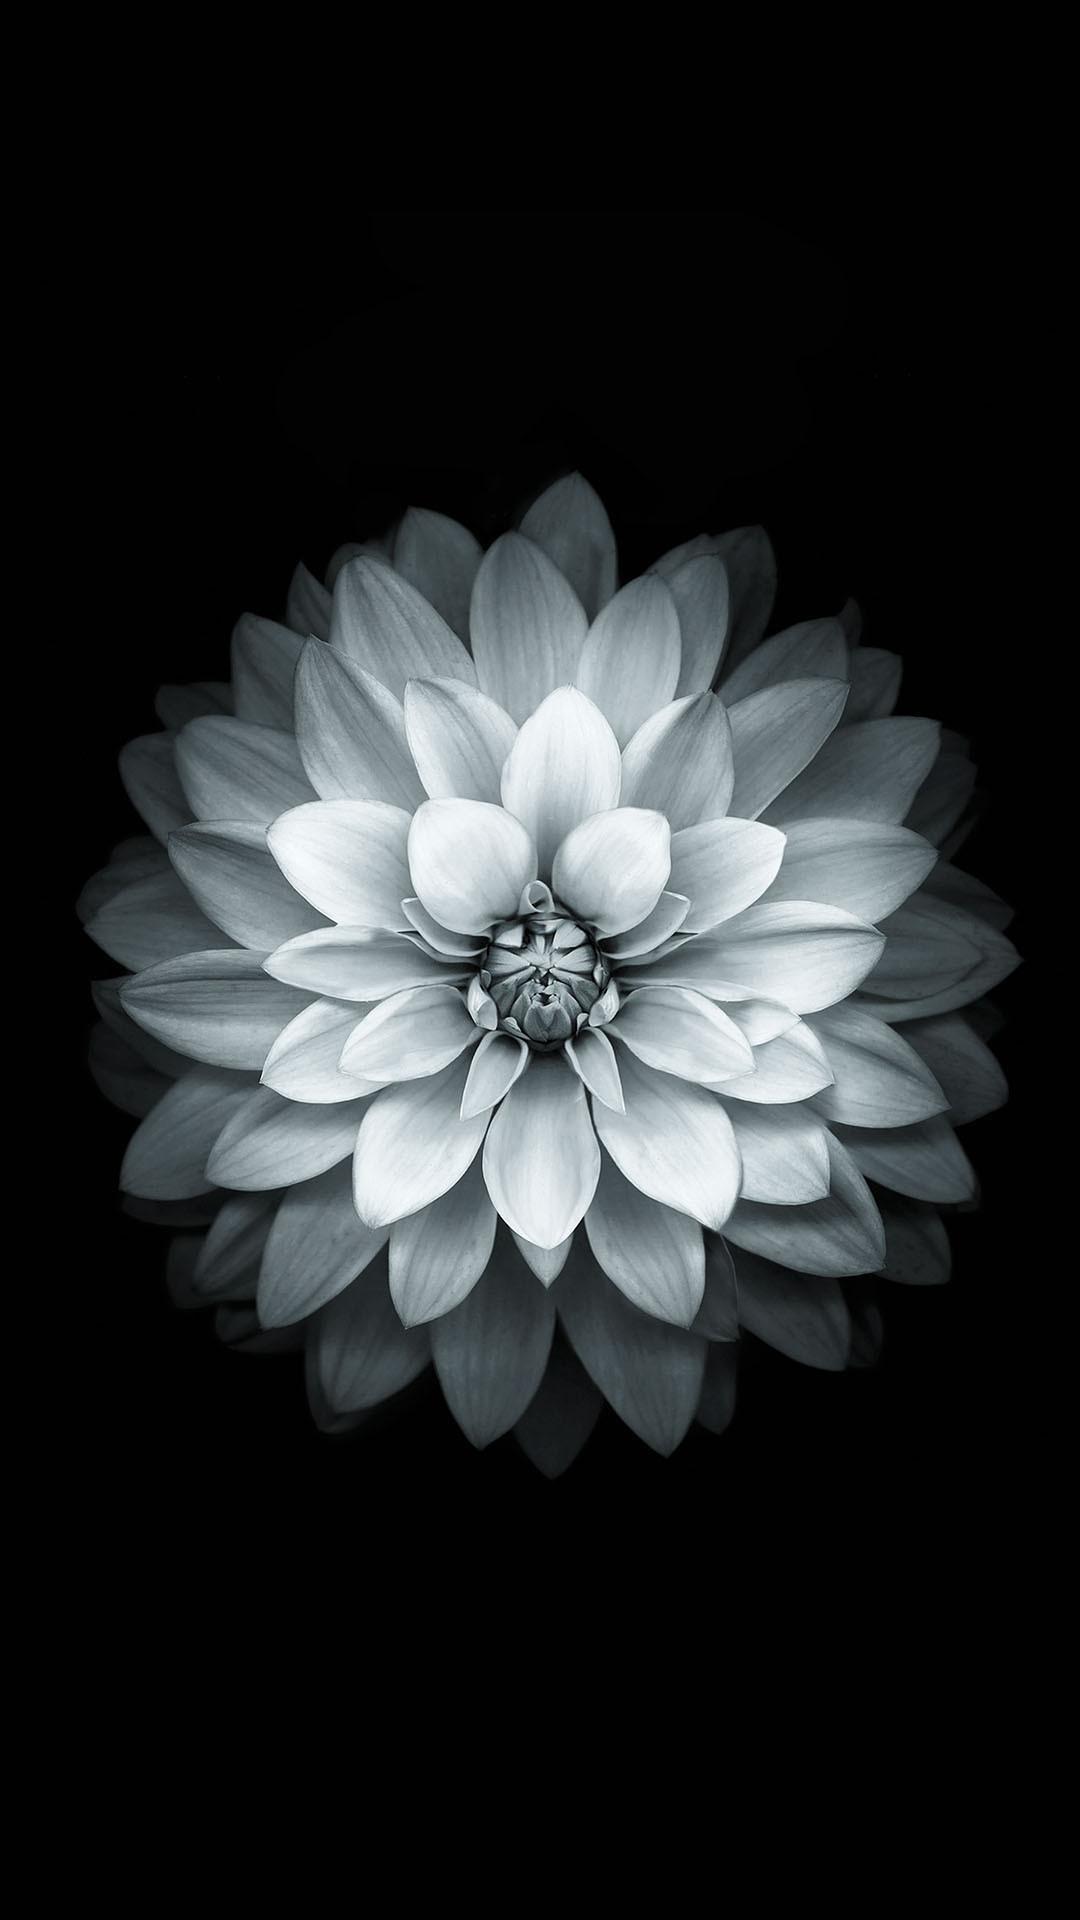 1080x1920 black white apple lotus flower android wallpaper